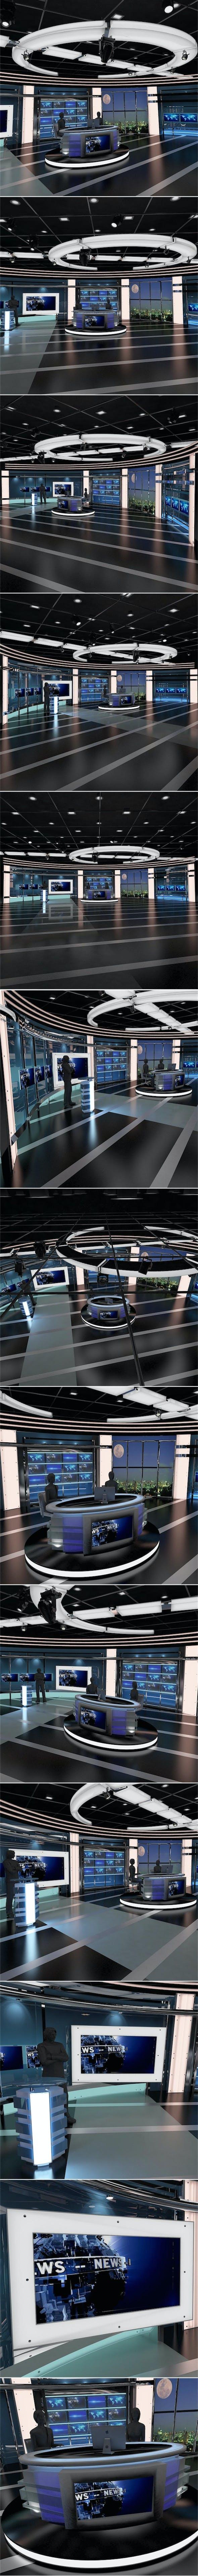 Virtual TV Studio News Set 27 - 3DOcean Item for Sale